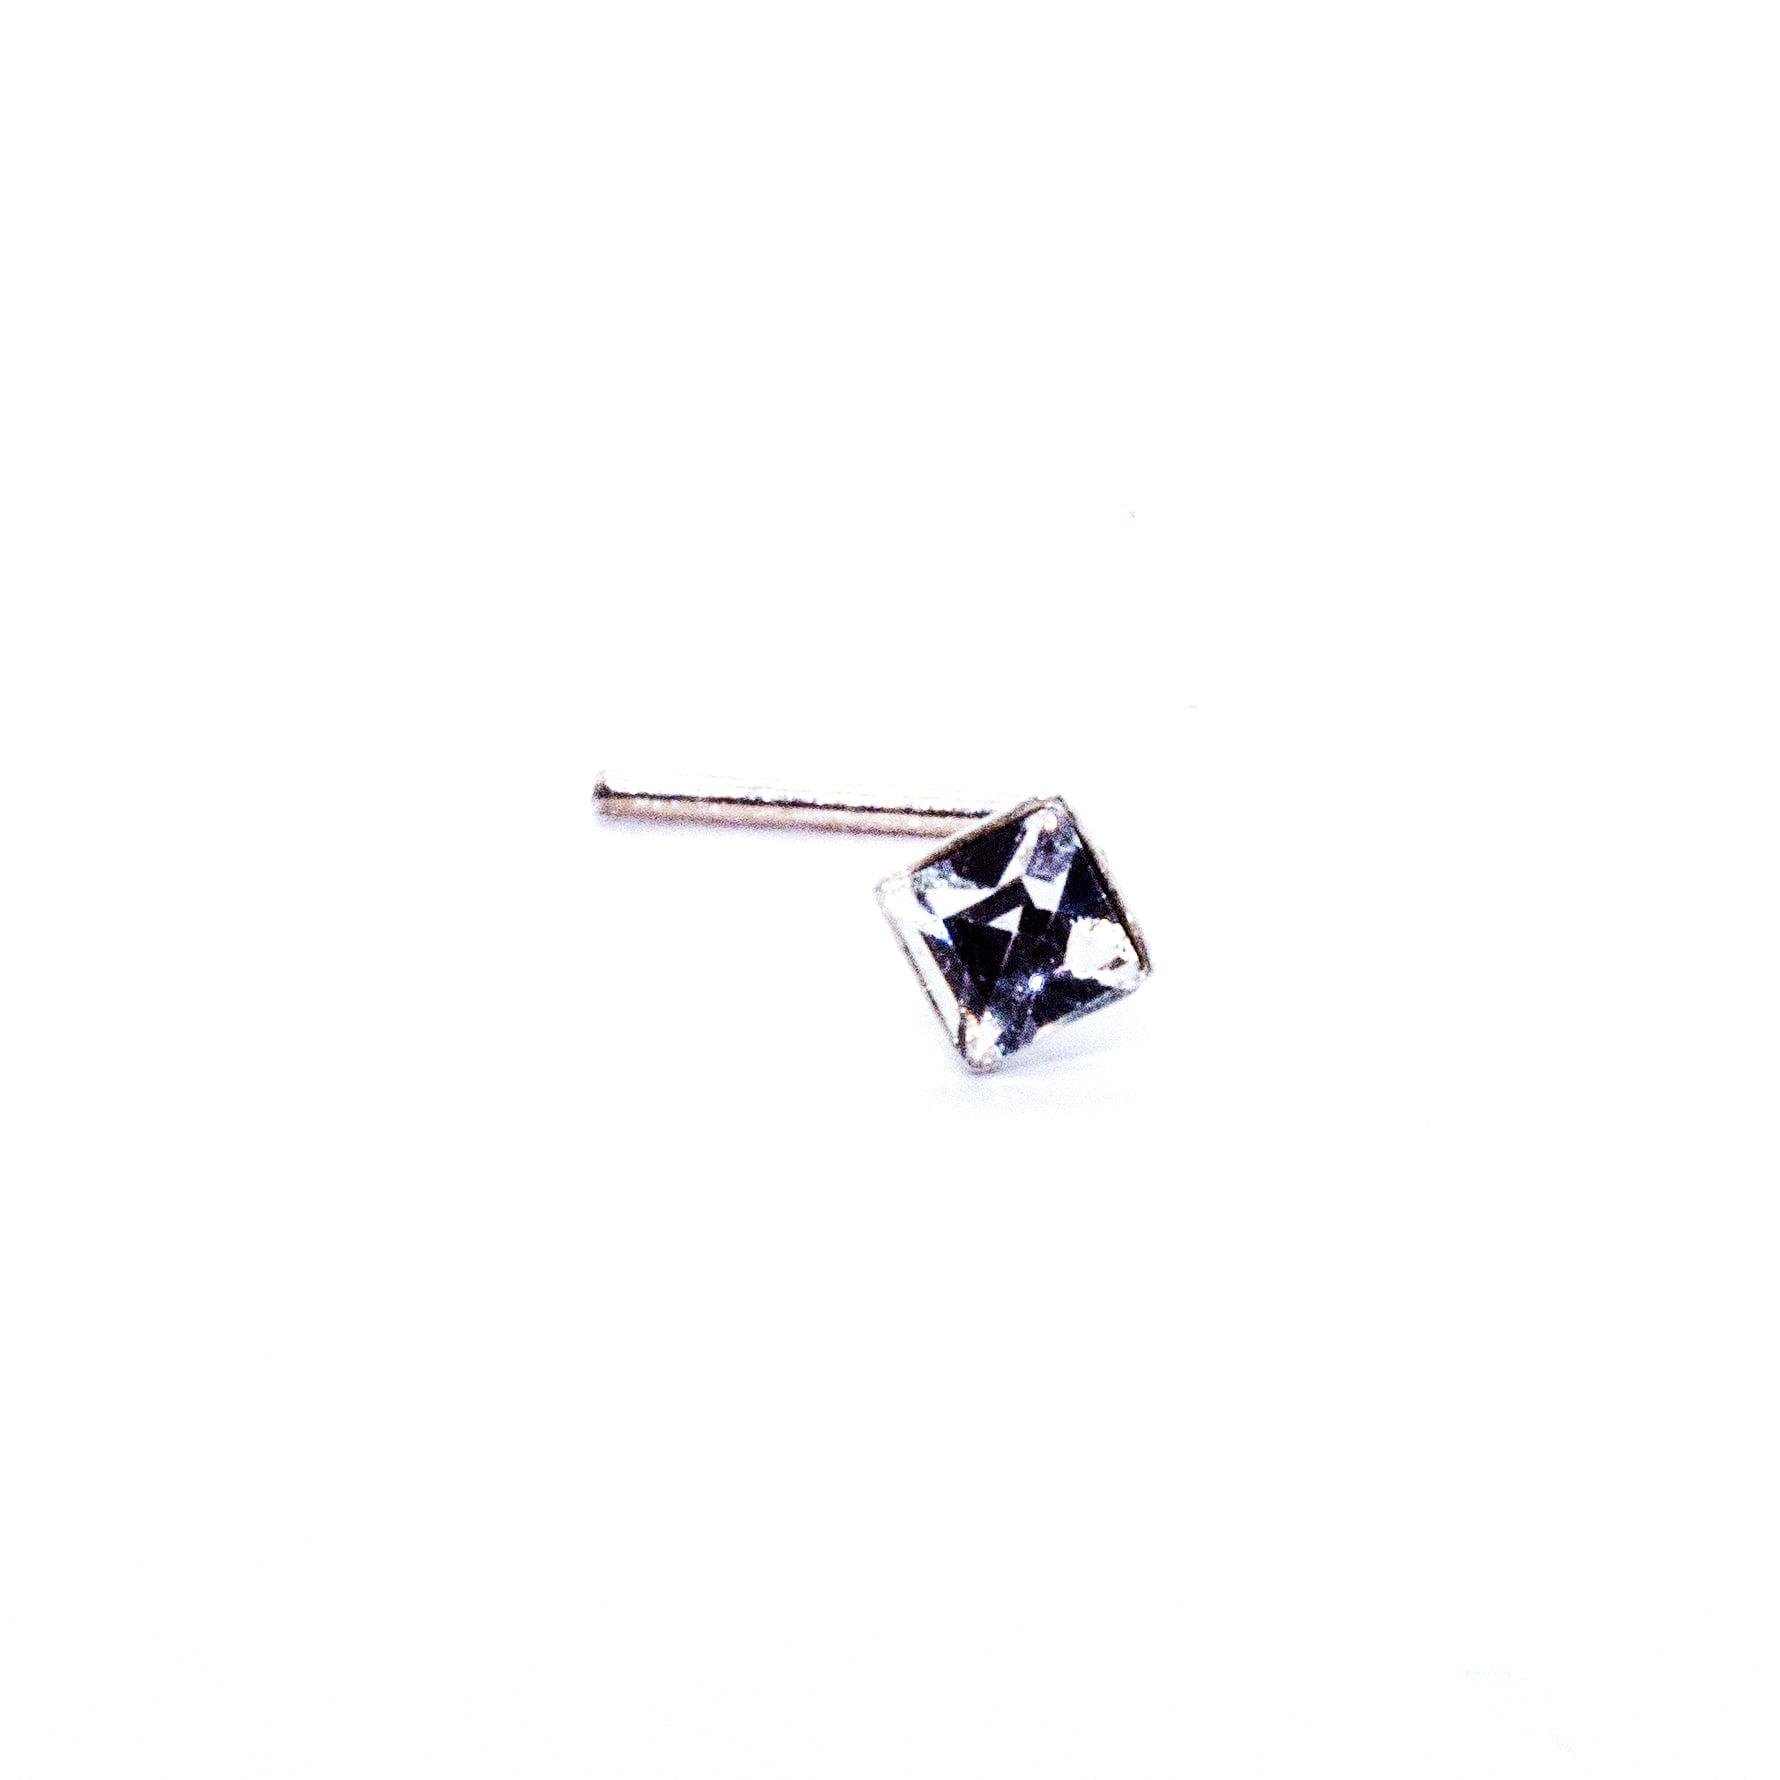 square crystal nose stud in sterling silver (alt3)